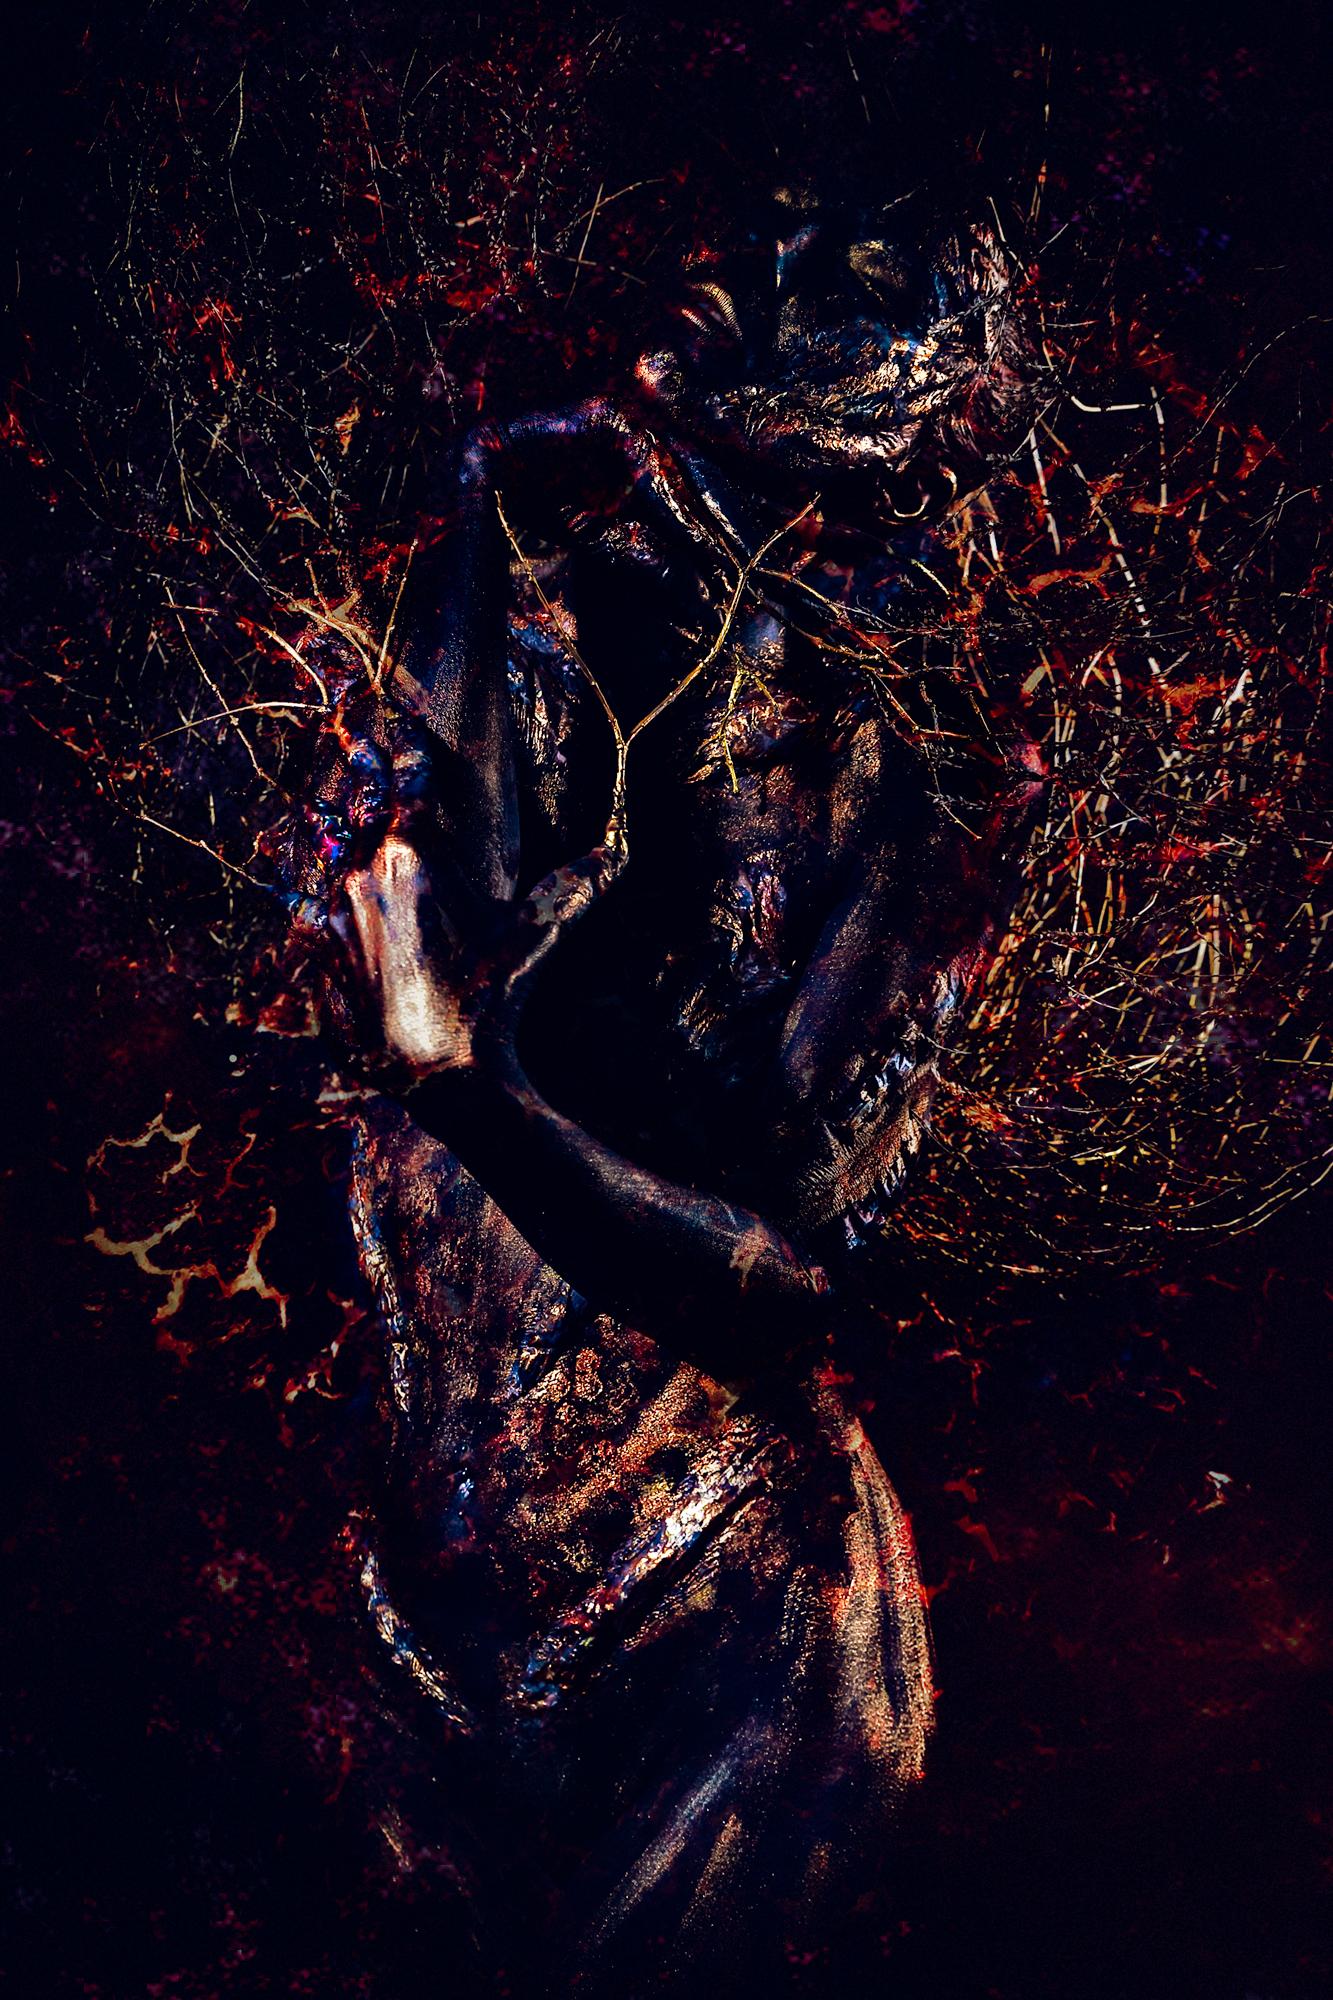 Nft The Soul of the burnt Tree